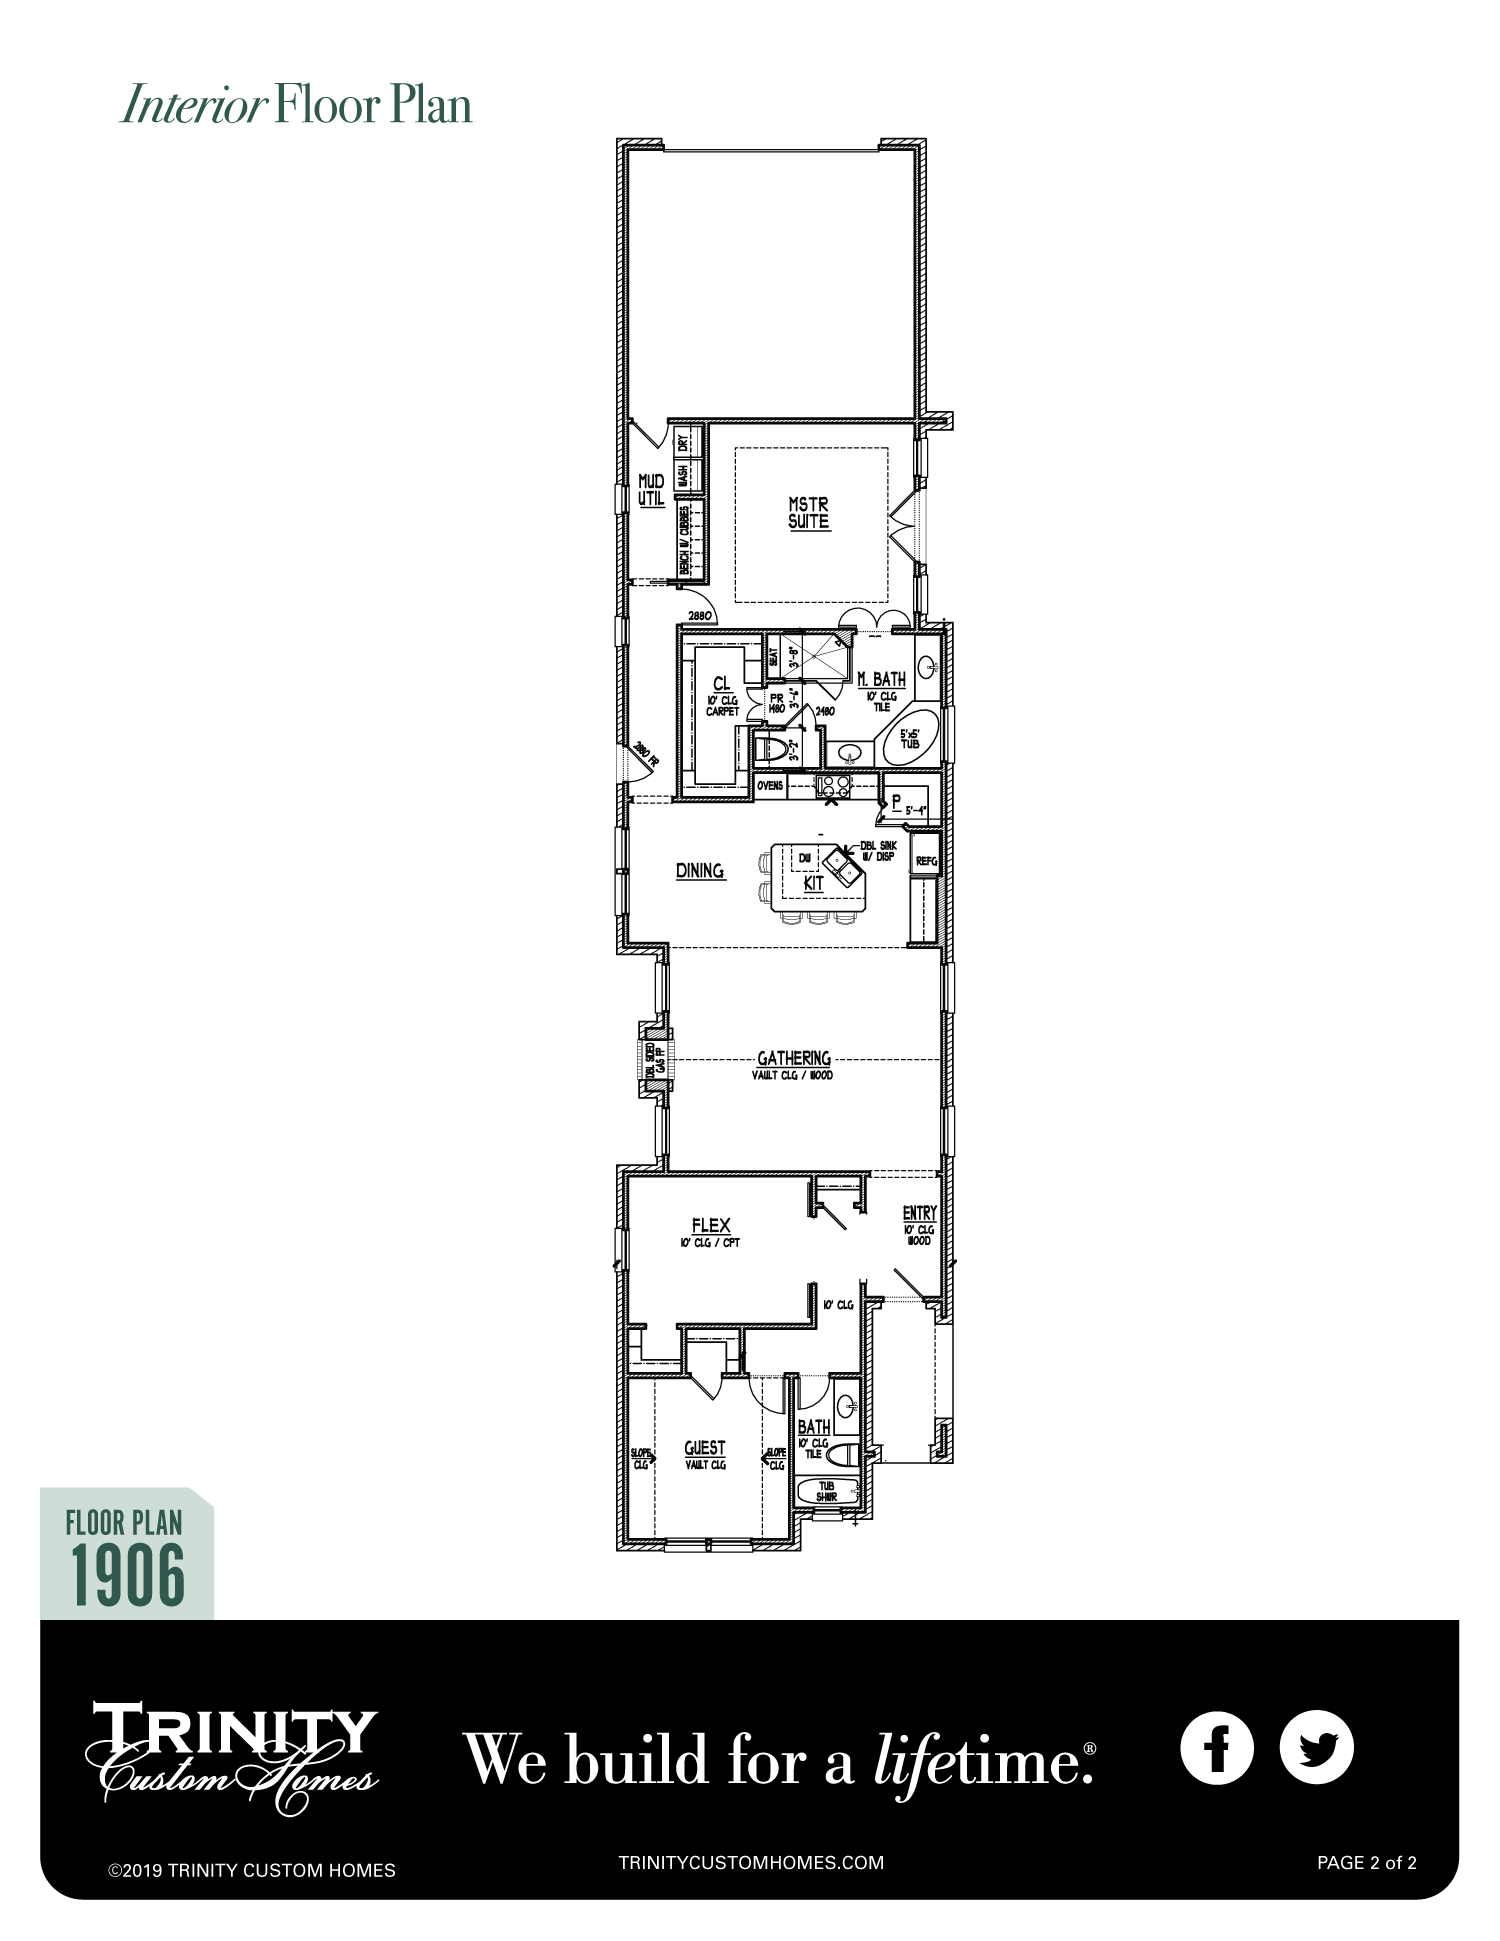 FloorPlan1906